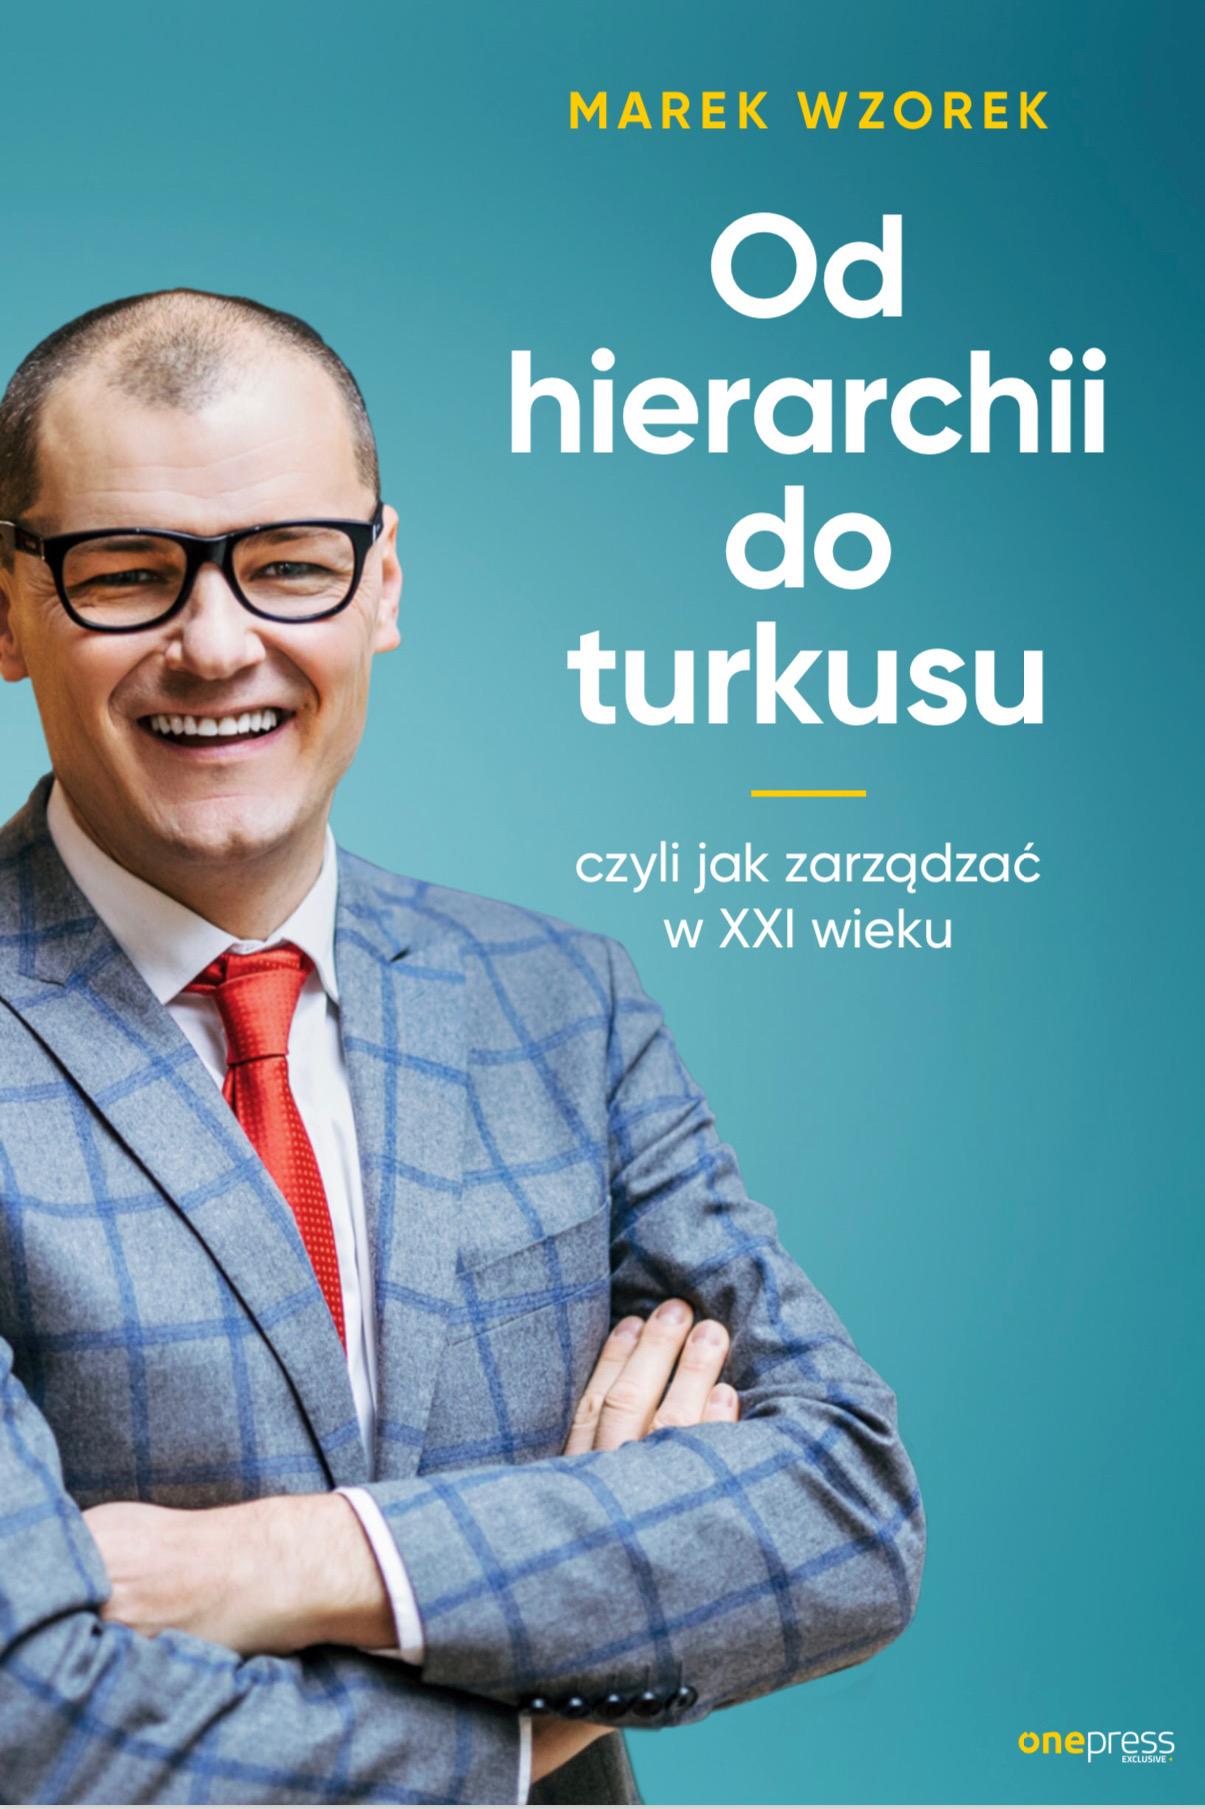 Okładka książki Od hierarchii do turkusu.jpeg (424 KB)